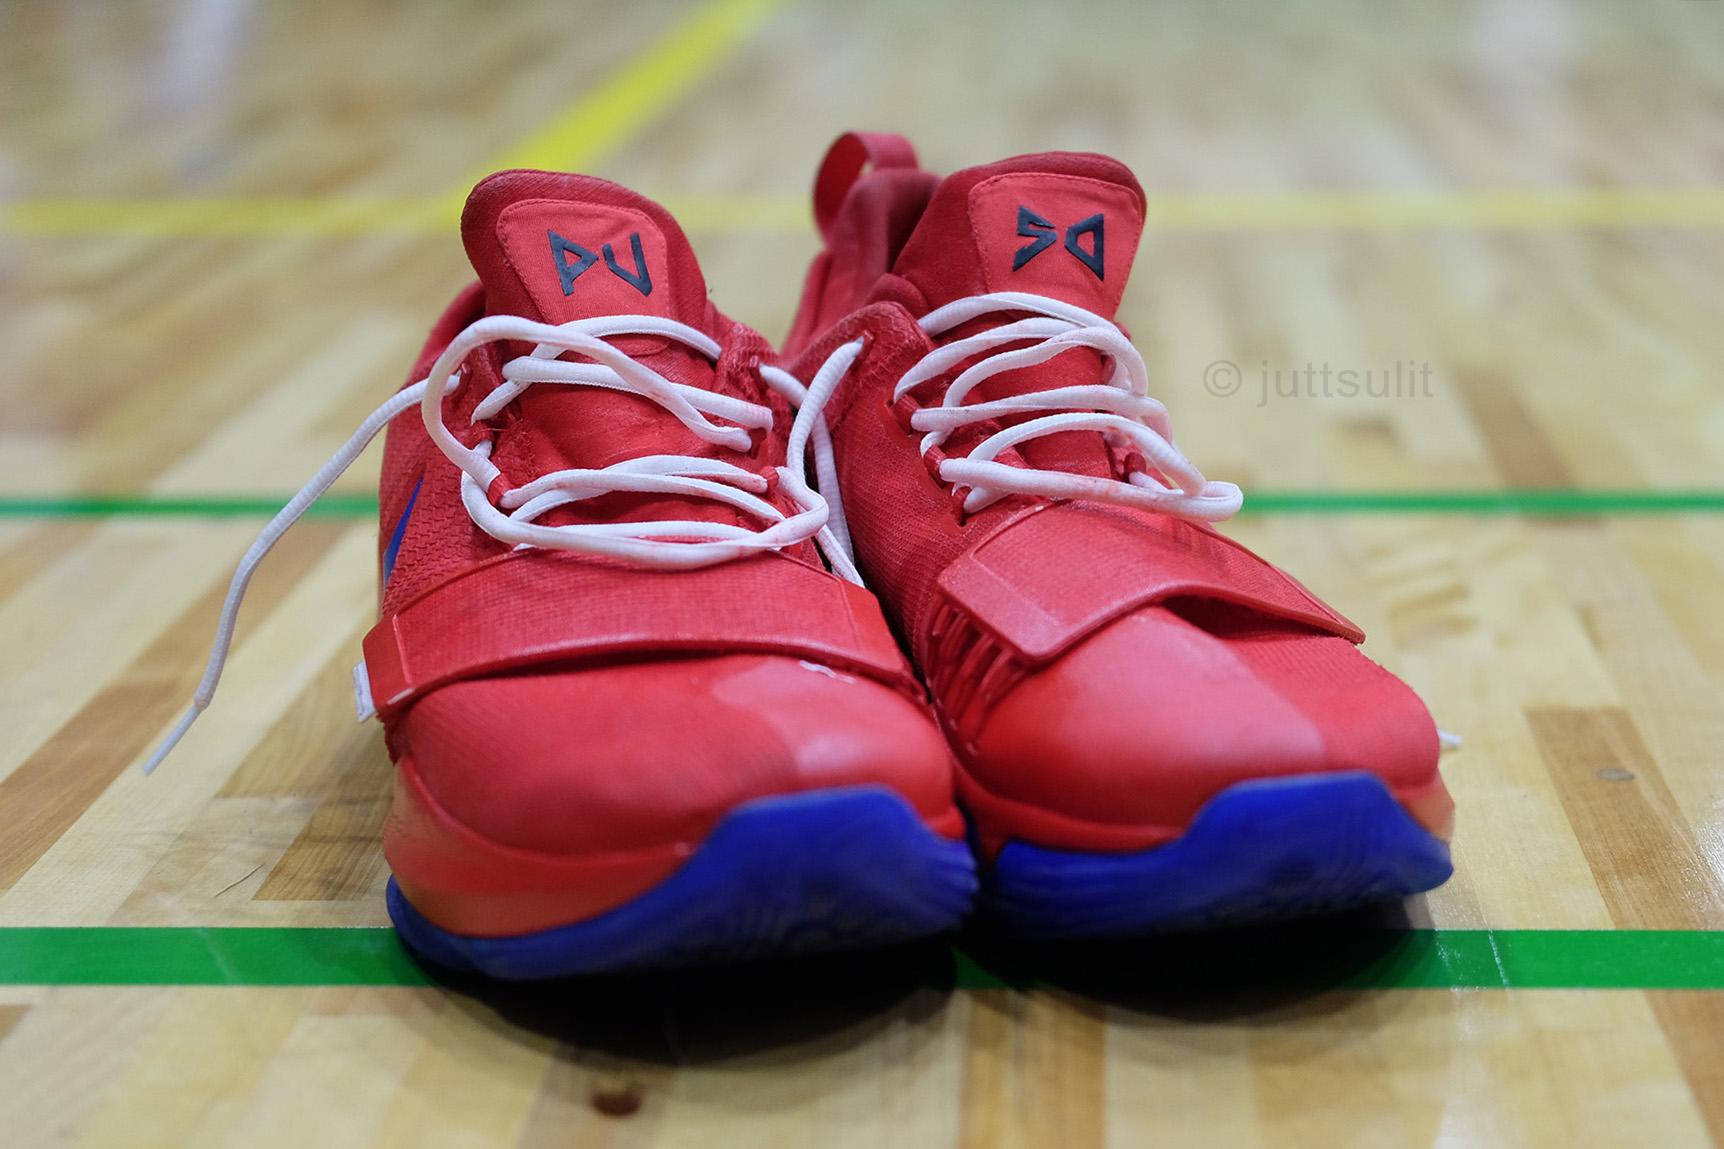 LOOK: Kiefer Ravena has his Nike PG1 customized in Gilas colorway